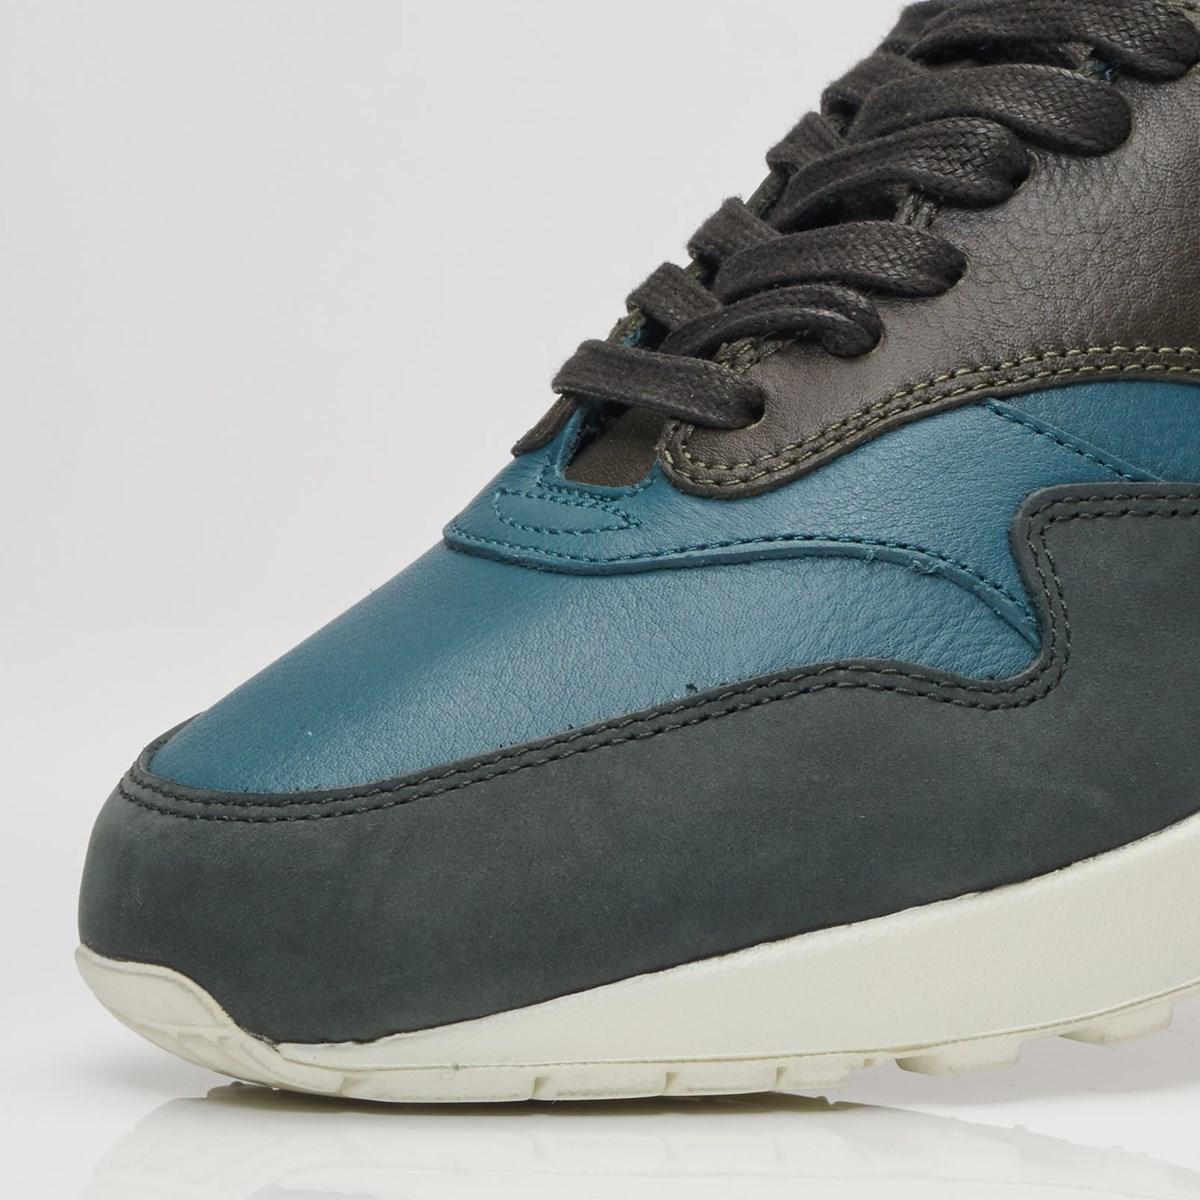 Sell and buy Nike Air Max 1 Pinnacle Iced Jade Shoes Men